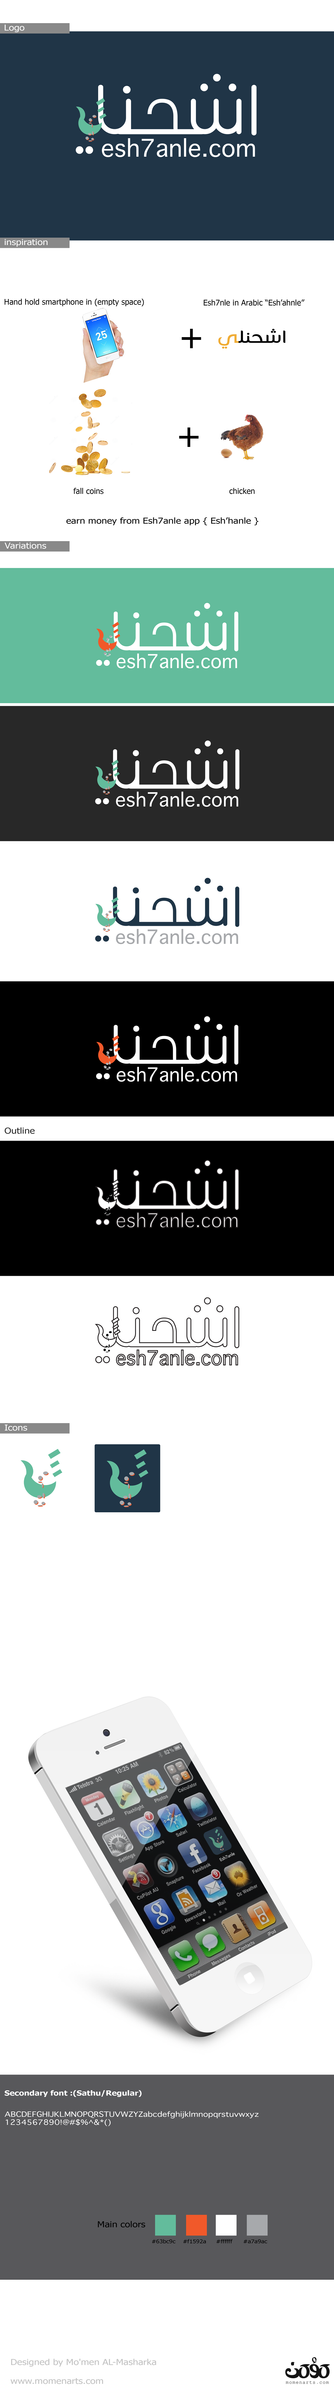 Esh7anle Logo by momenarts